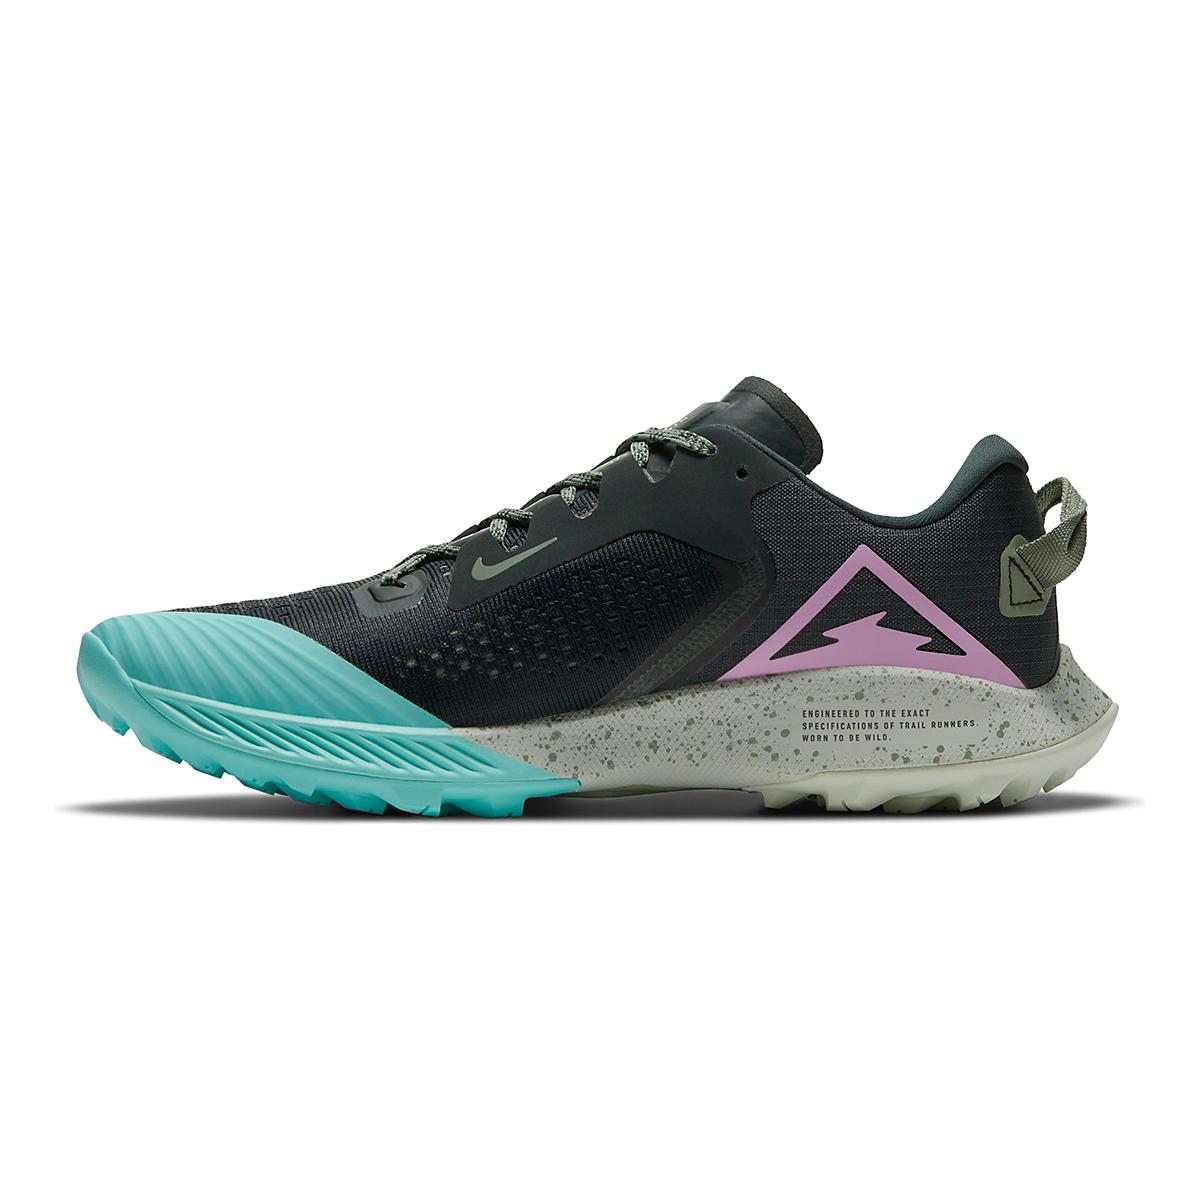 Women's Nike Air Zoom Terra Kiger 6 Trail Running Shoe - Color: Seaweed/Beyond Pink - Size: 5 - Width: Regular, Seaweed/Beyond Pink, large, image 2